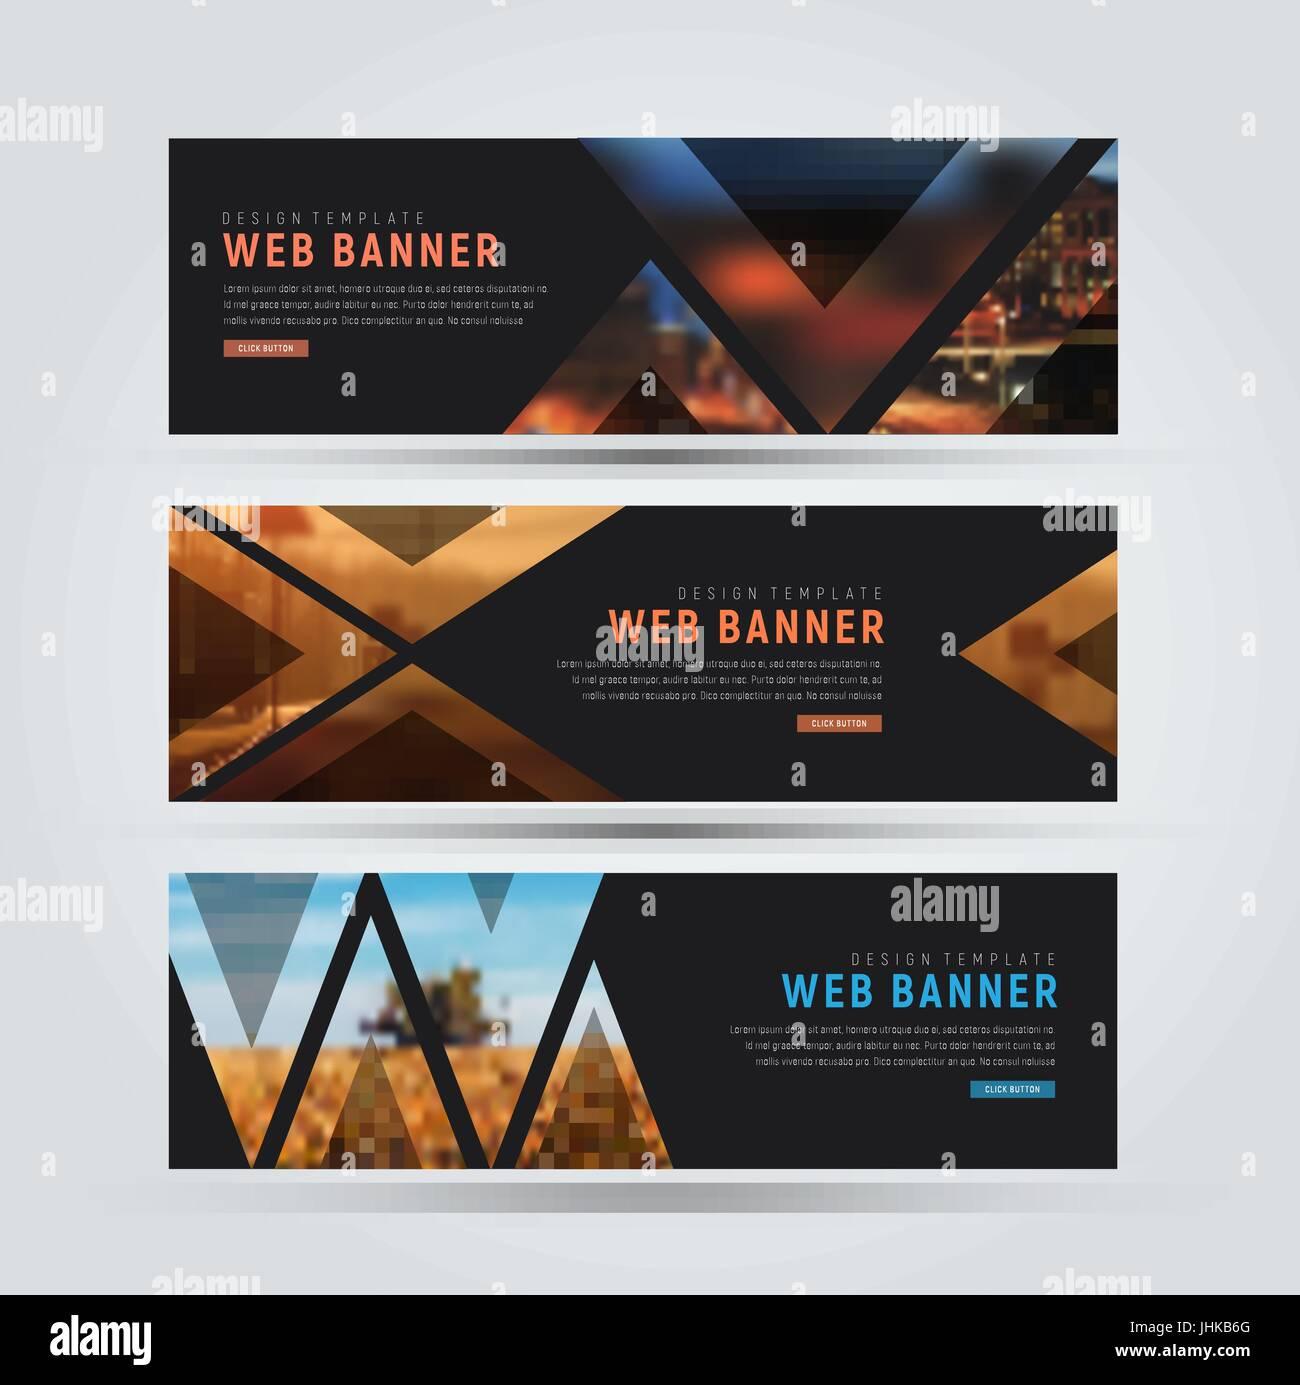 Design of black horizontal web banners templates of standard size design of black horizontal web banners templates of standard size with triangles for a photo vector illustration set maxwellsz